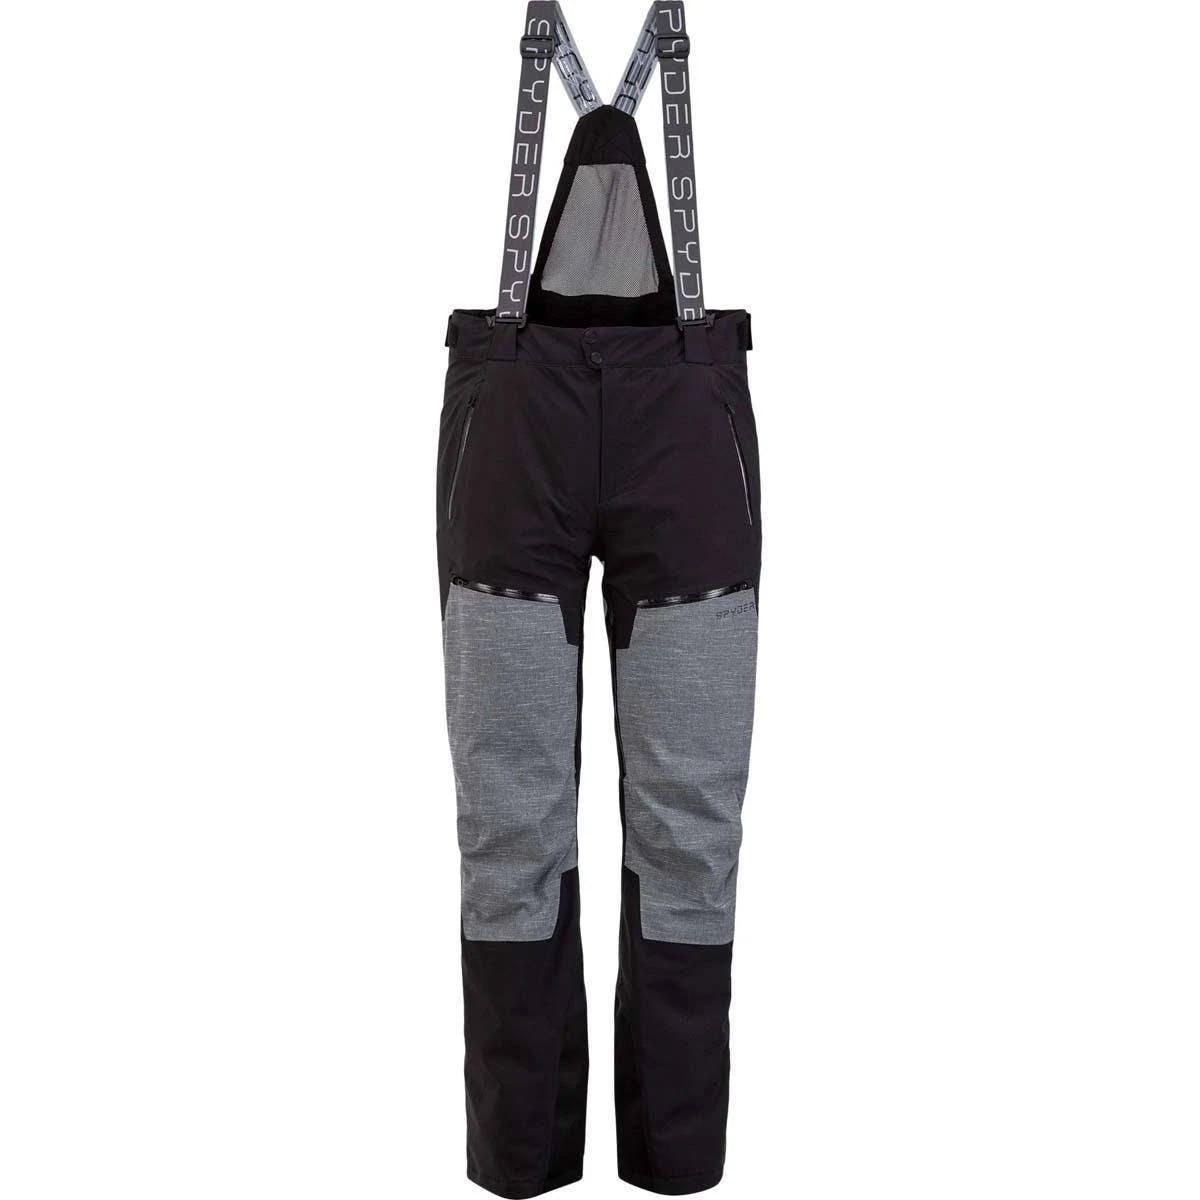 Spyder Propulsion Pant Men's Black XL